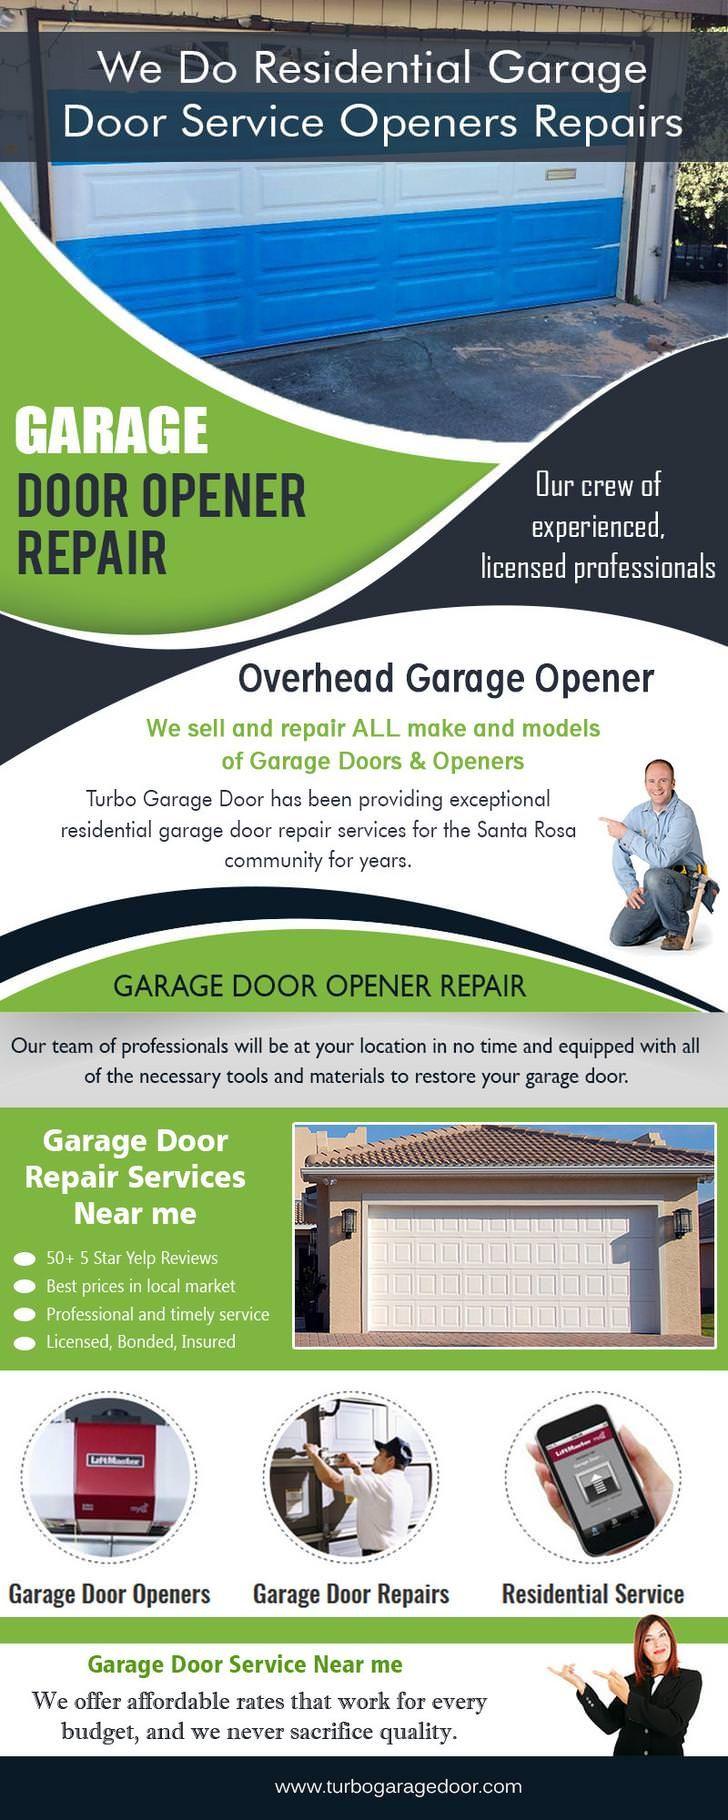 Garage Door Opener Repair Garage Door Opener Repair Garage Doors Garage Service Door